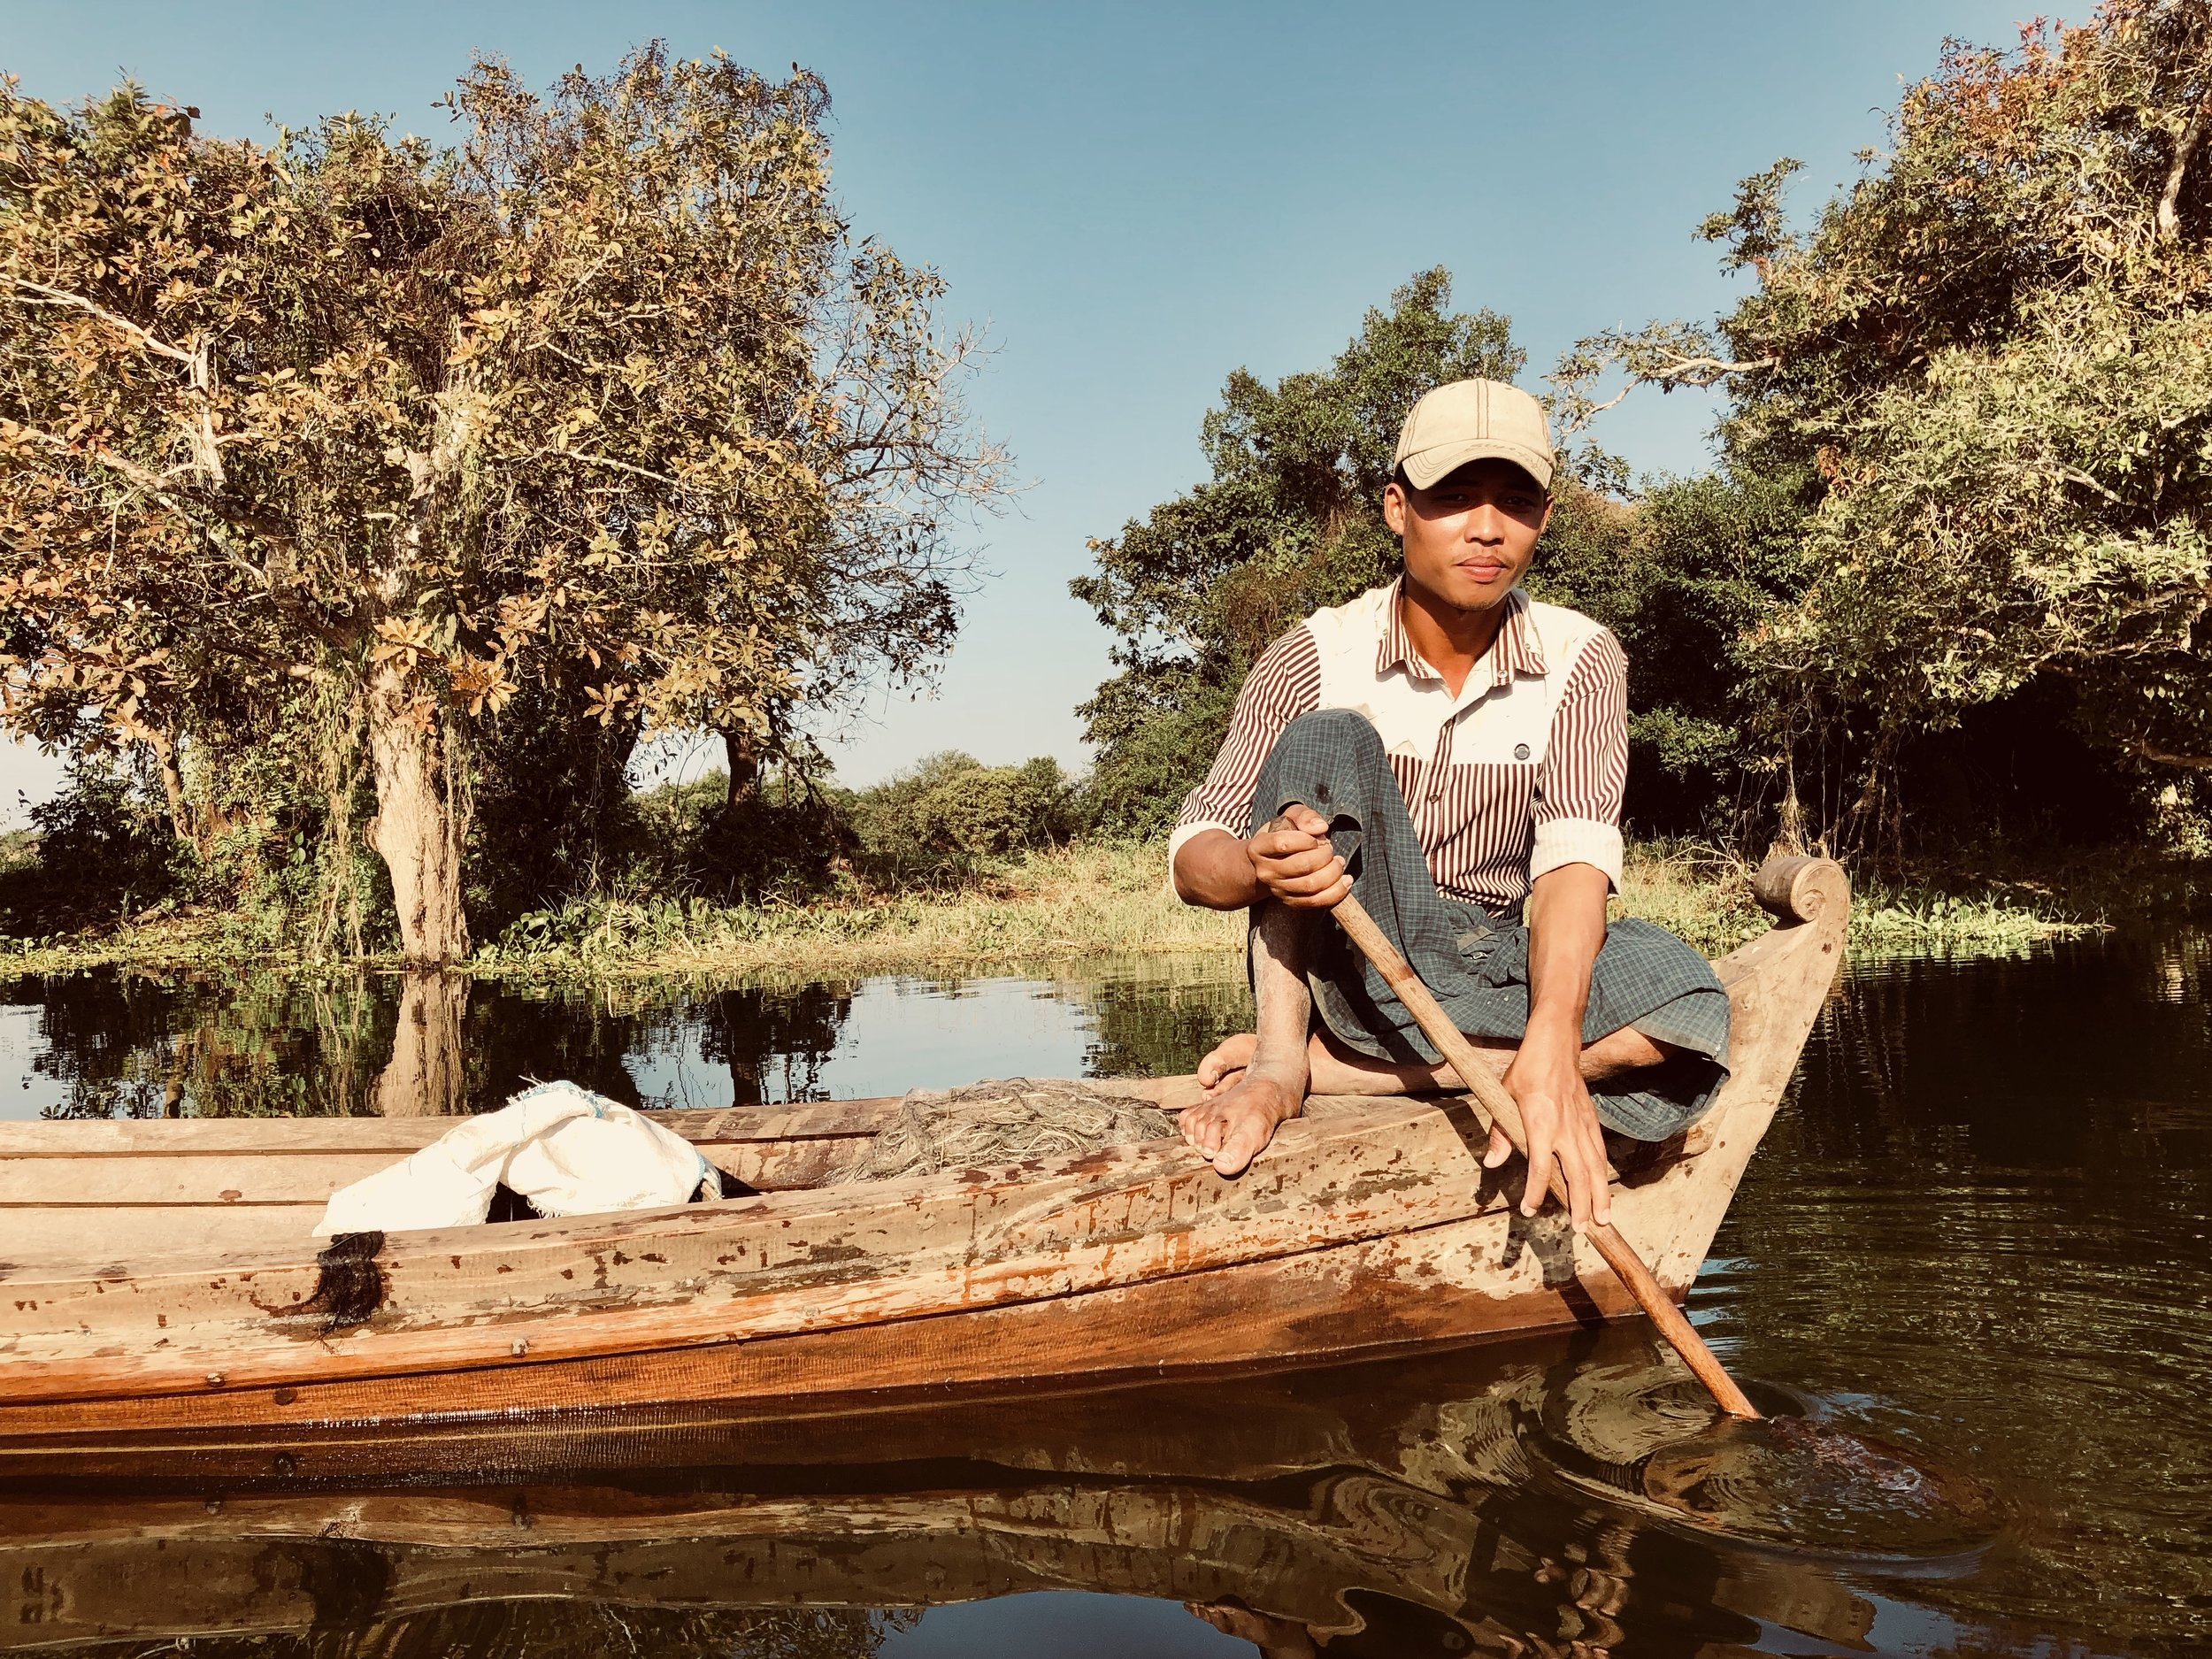 Local fishermen cast their nets